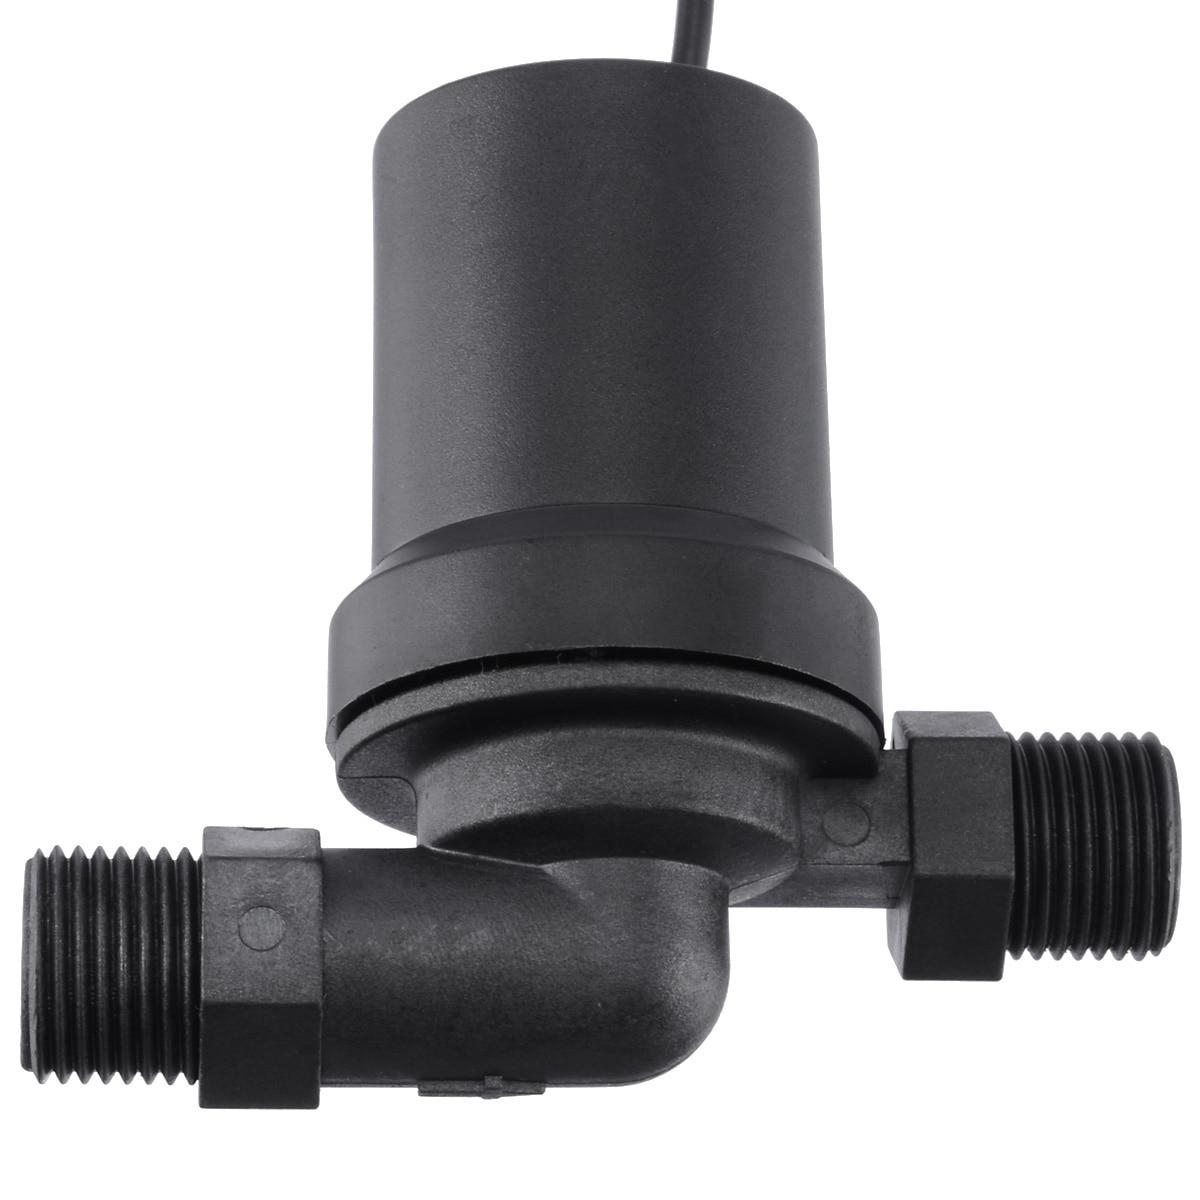 DC12V 650L/H Hot Water Circulation Pump Durable Brushless Motor Micro High Pressure Diaphragm Pumps